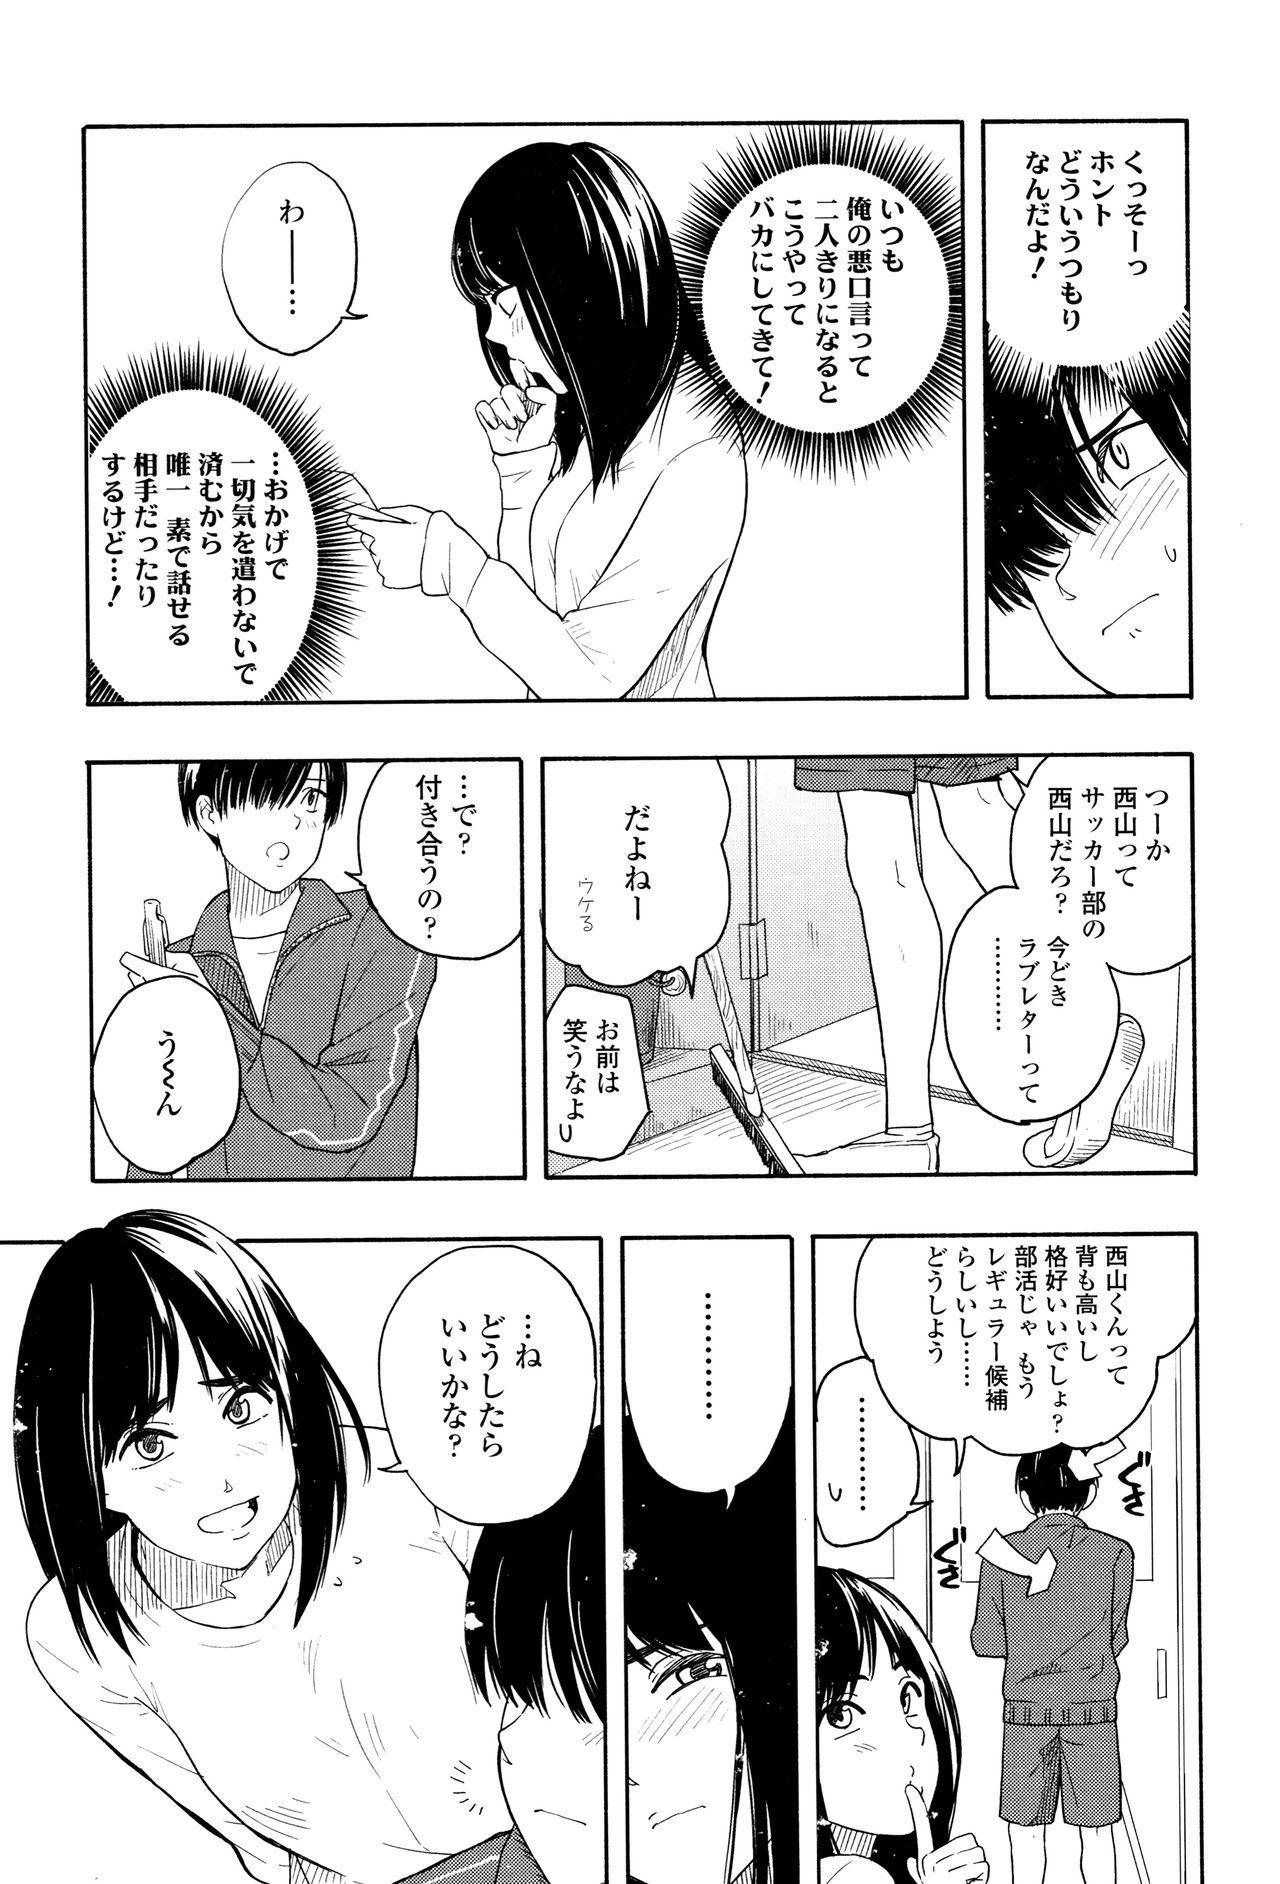 Shishunki no Eros - puberty eros 29